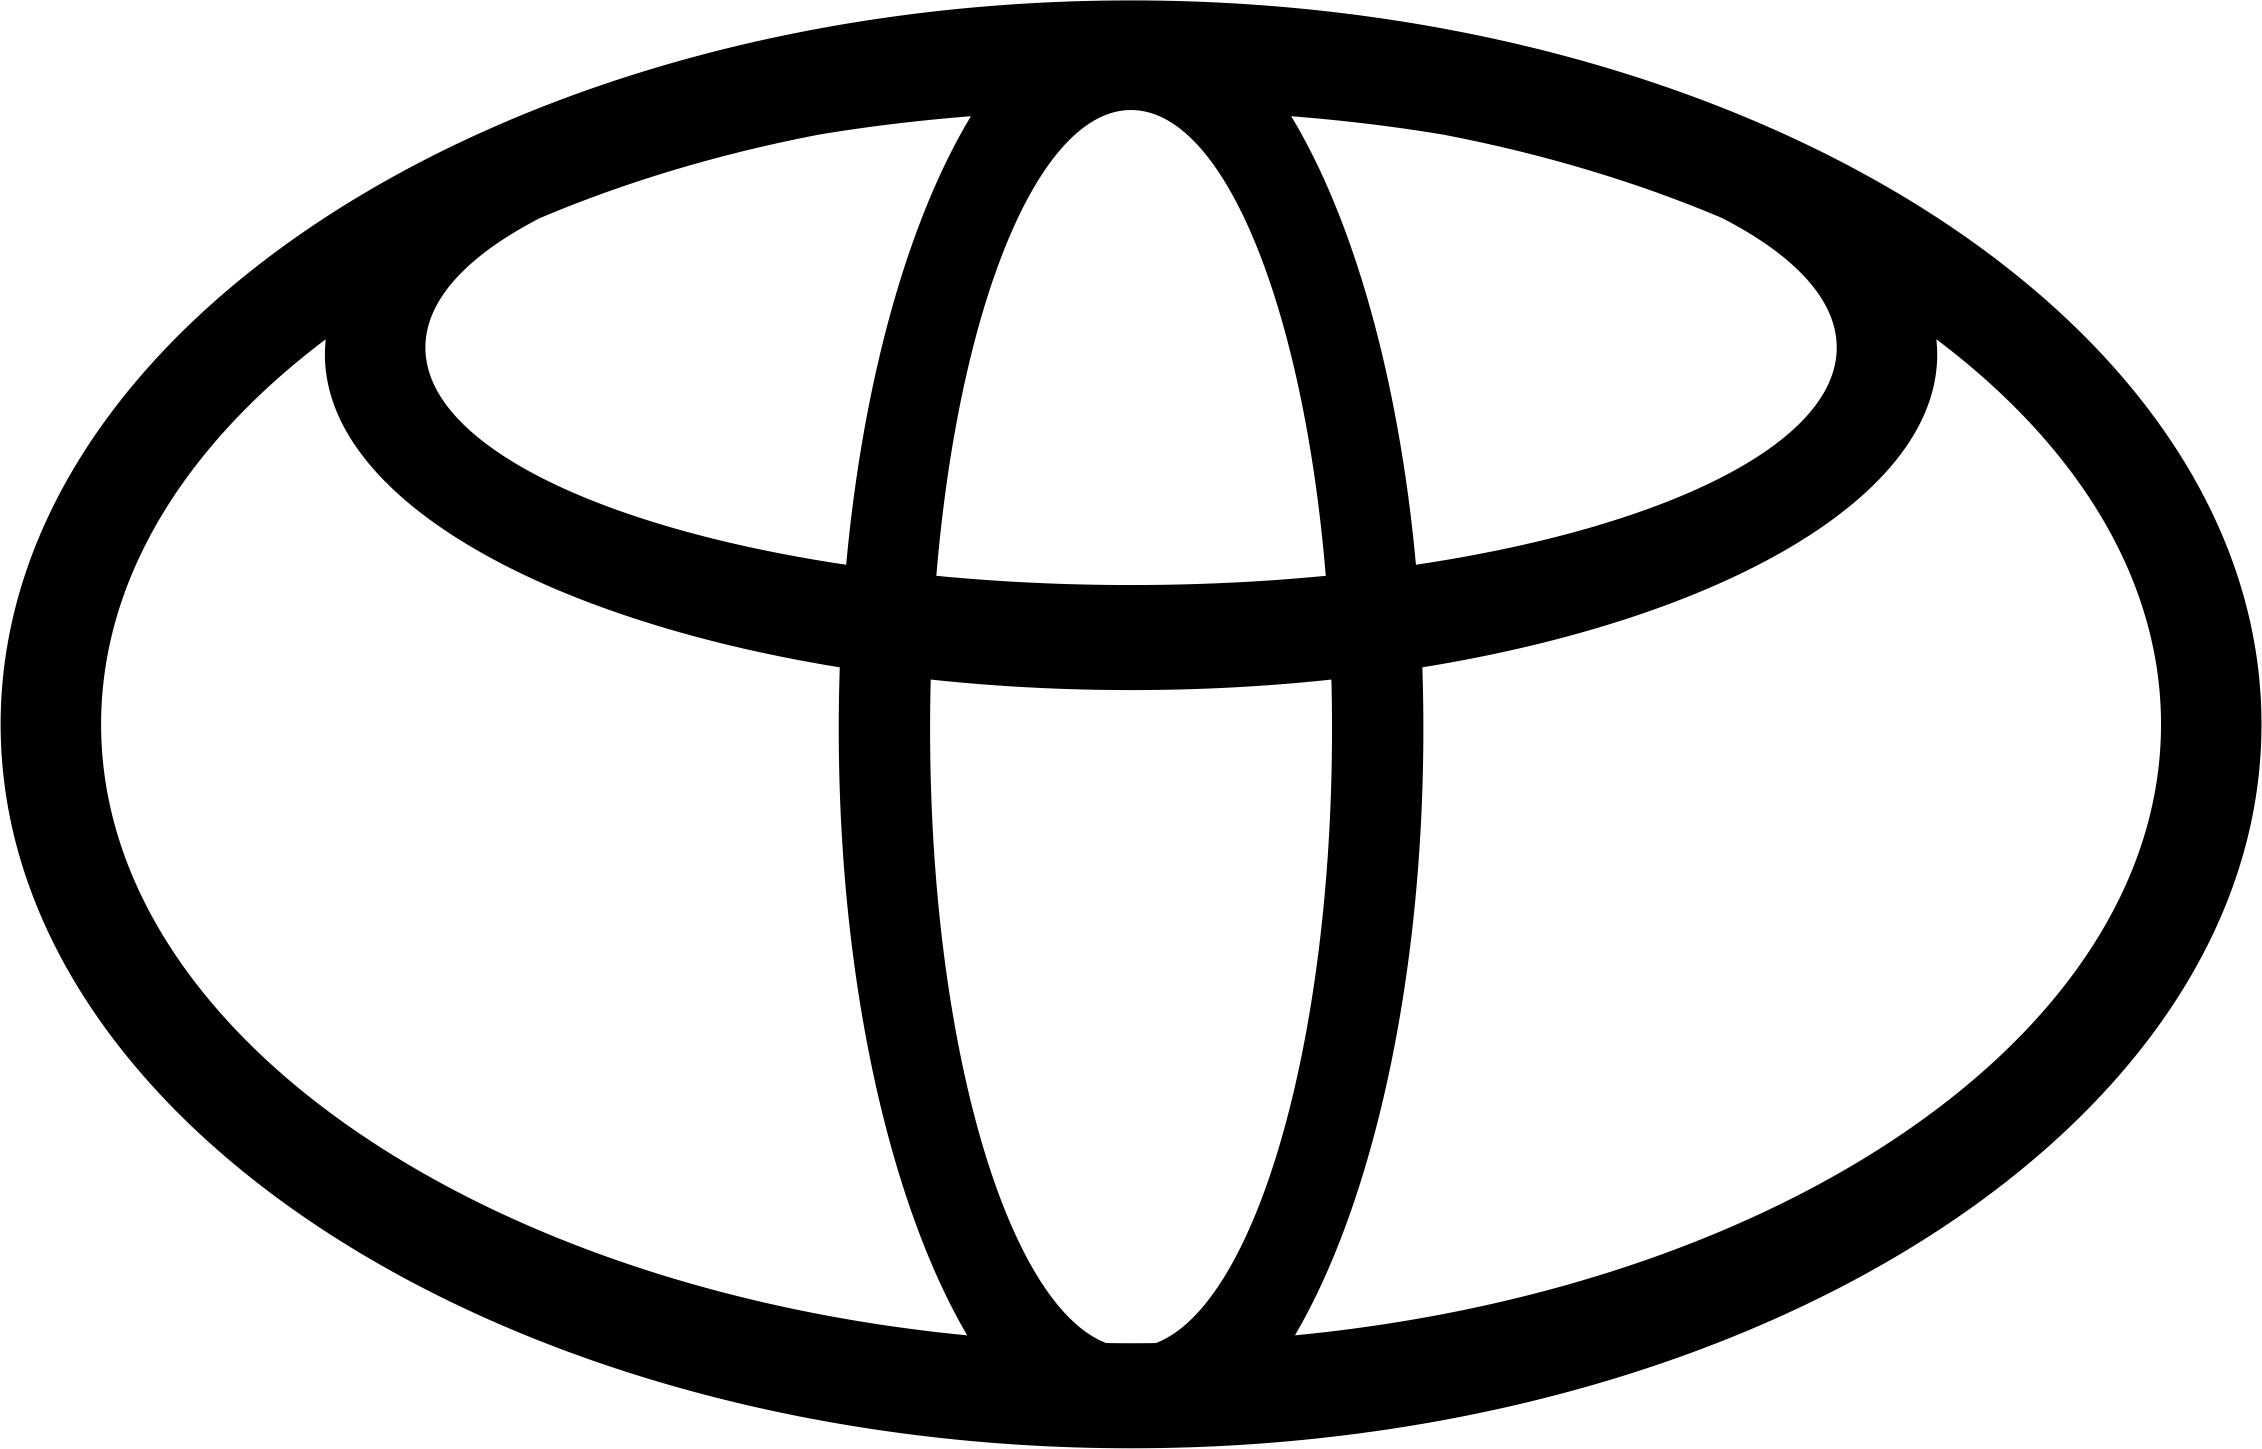 toyota logo vector coreldraw vector cdr file free download 3axis co rh 3axis co toyota logo vector ai toyota logo vector file